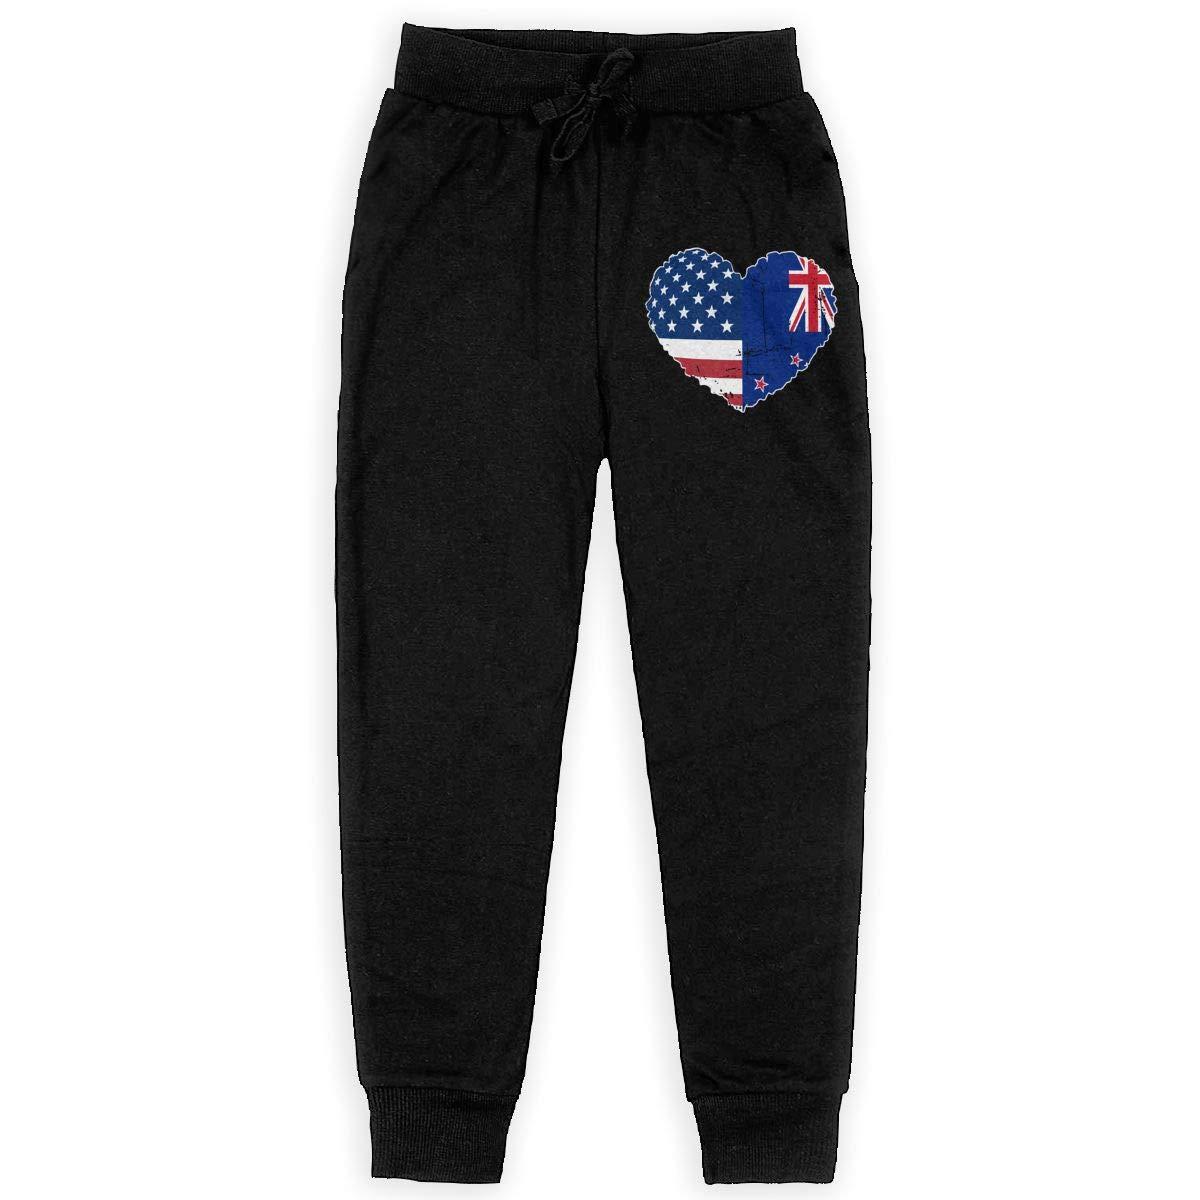 Boys Trousers Girls for Teenager Girls WYZVK22 Zealand USA Flag Heart Soft//Cozy Sweatpants